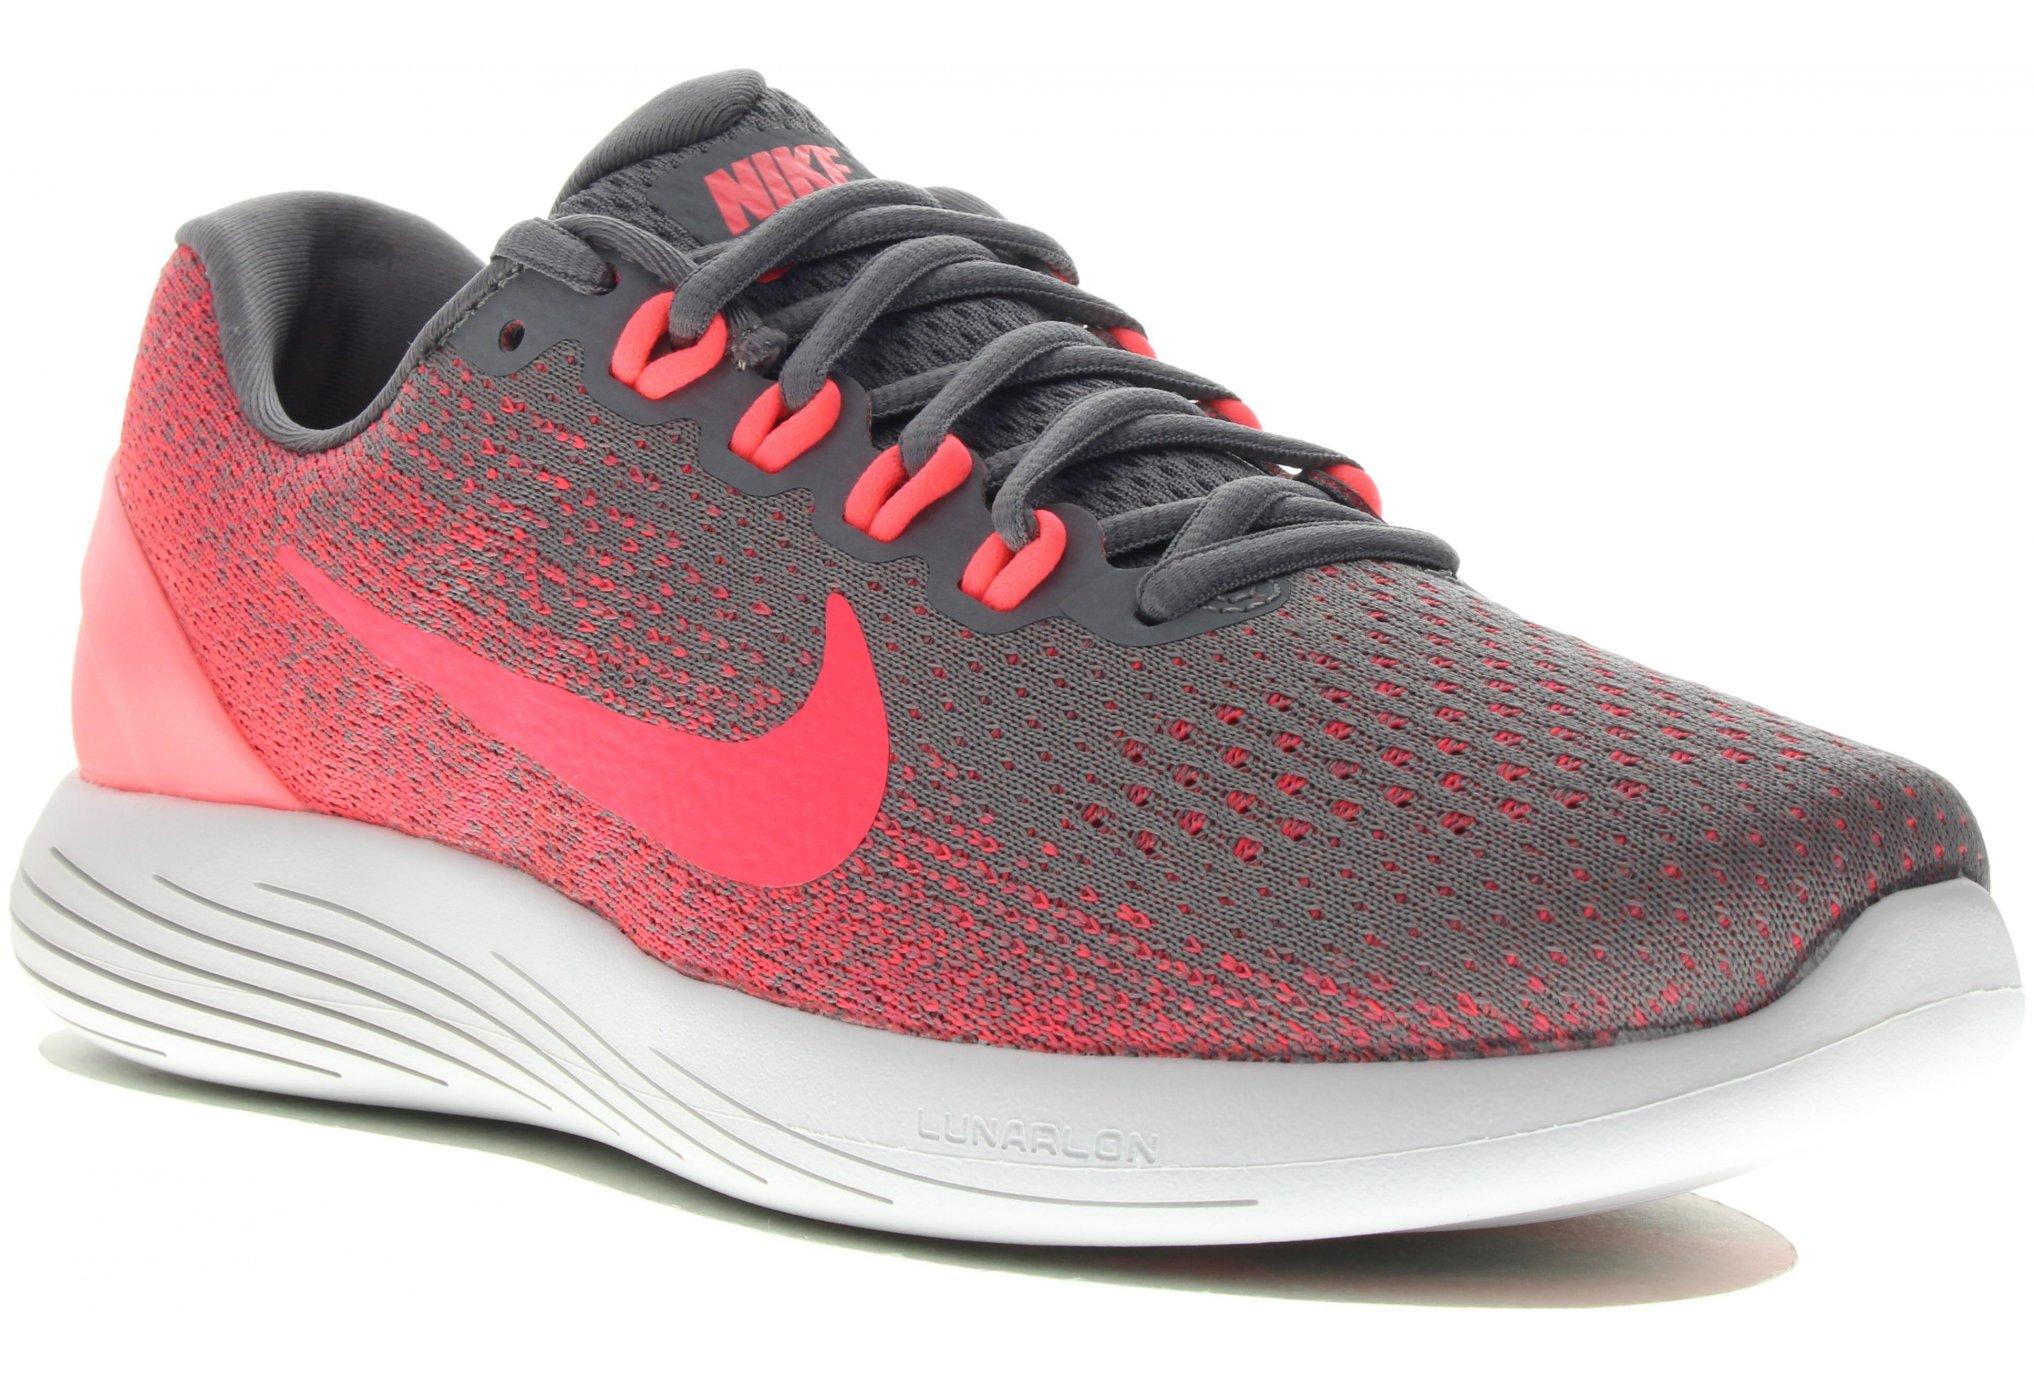 Nike Lunarglide 9 W Chaussures running femme